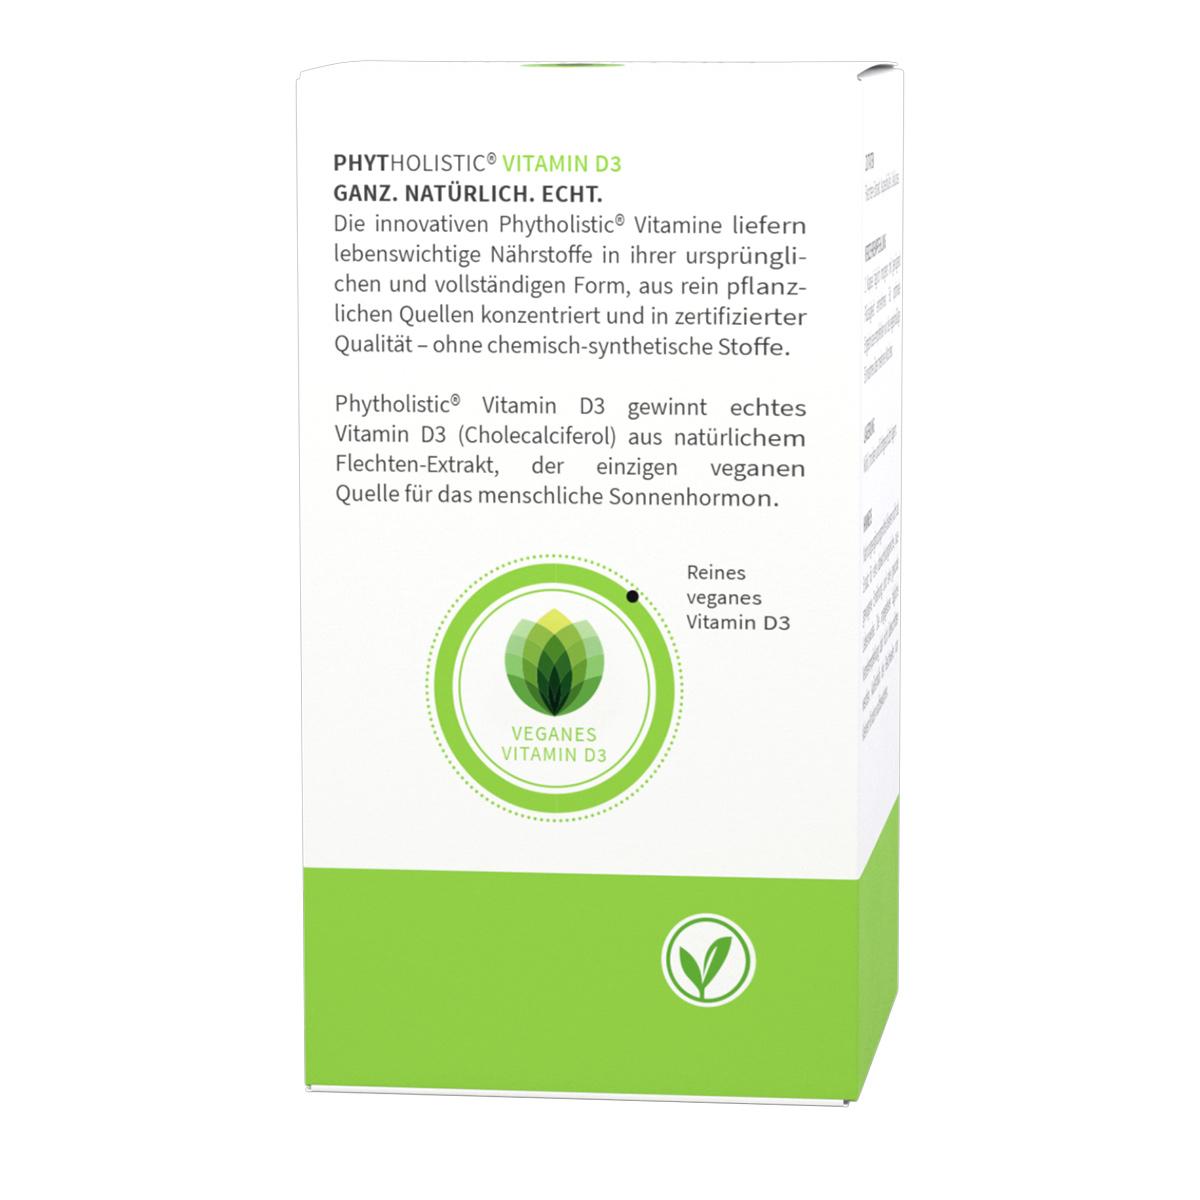 vitamin-d3-kapseln-vegan-phytholistic-180-stueck-verpackung-hinten-1200x1200